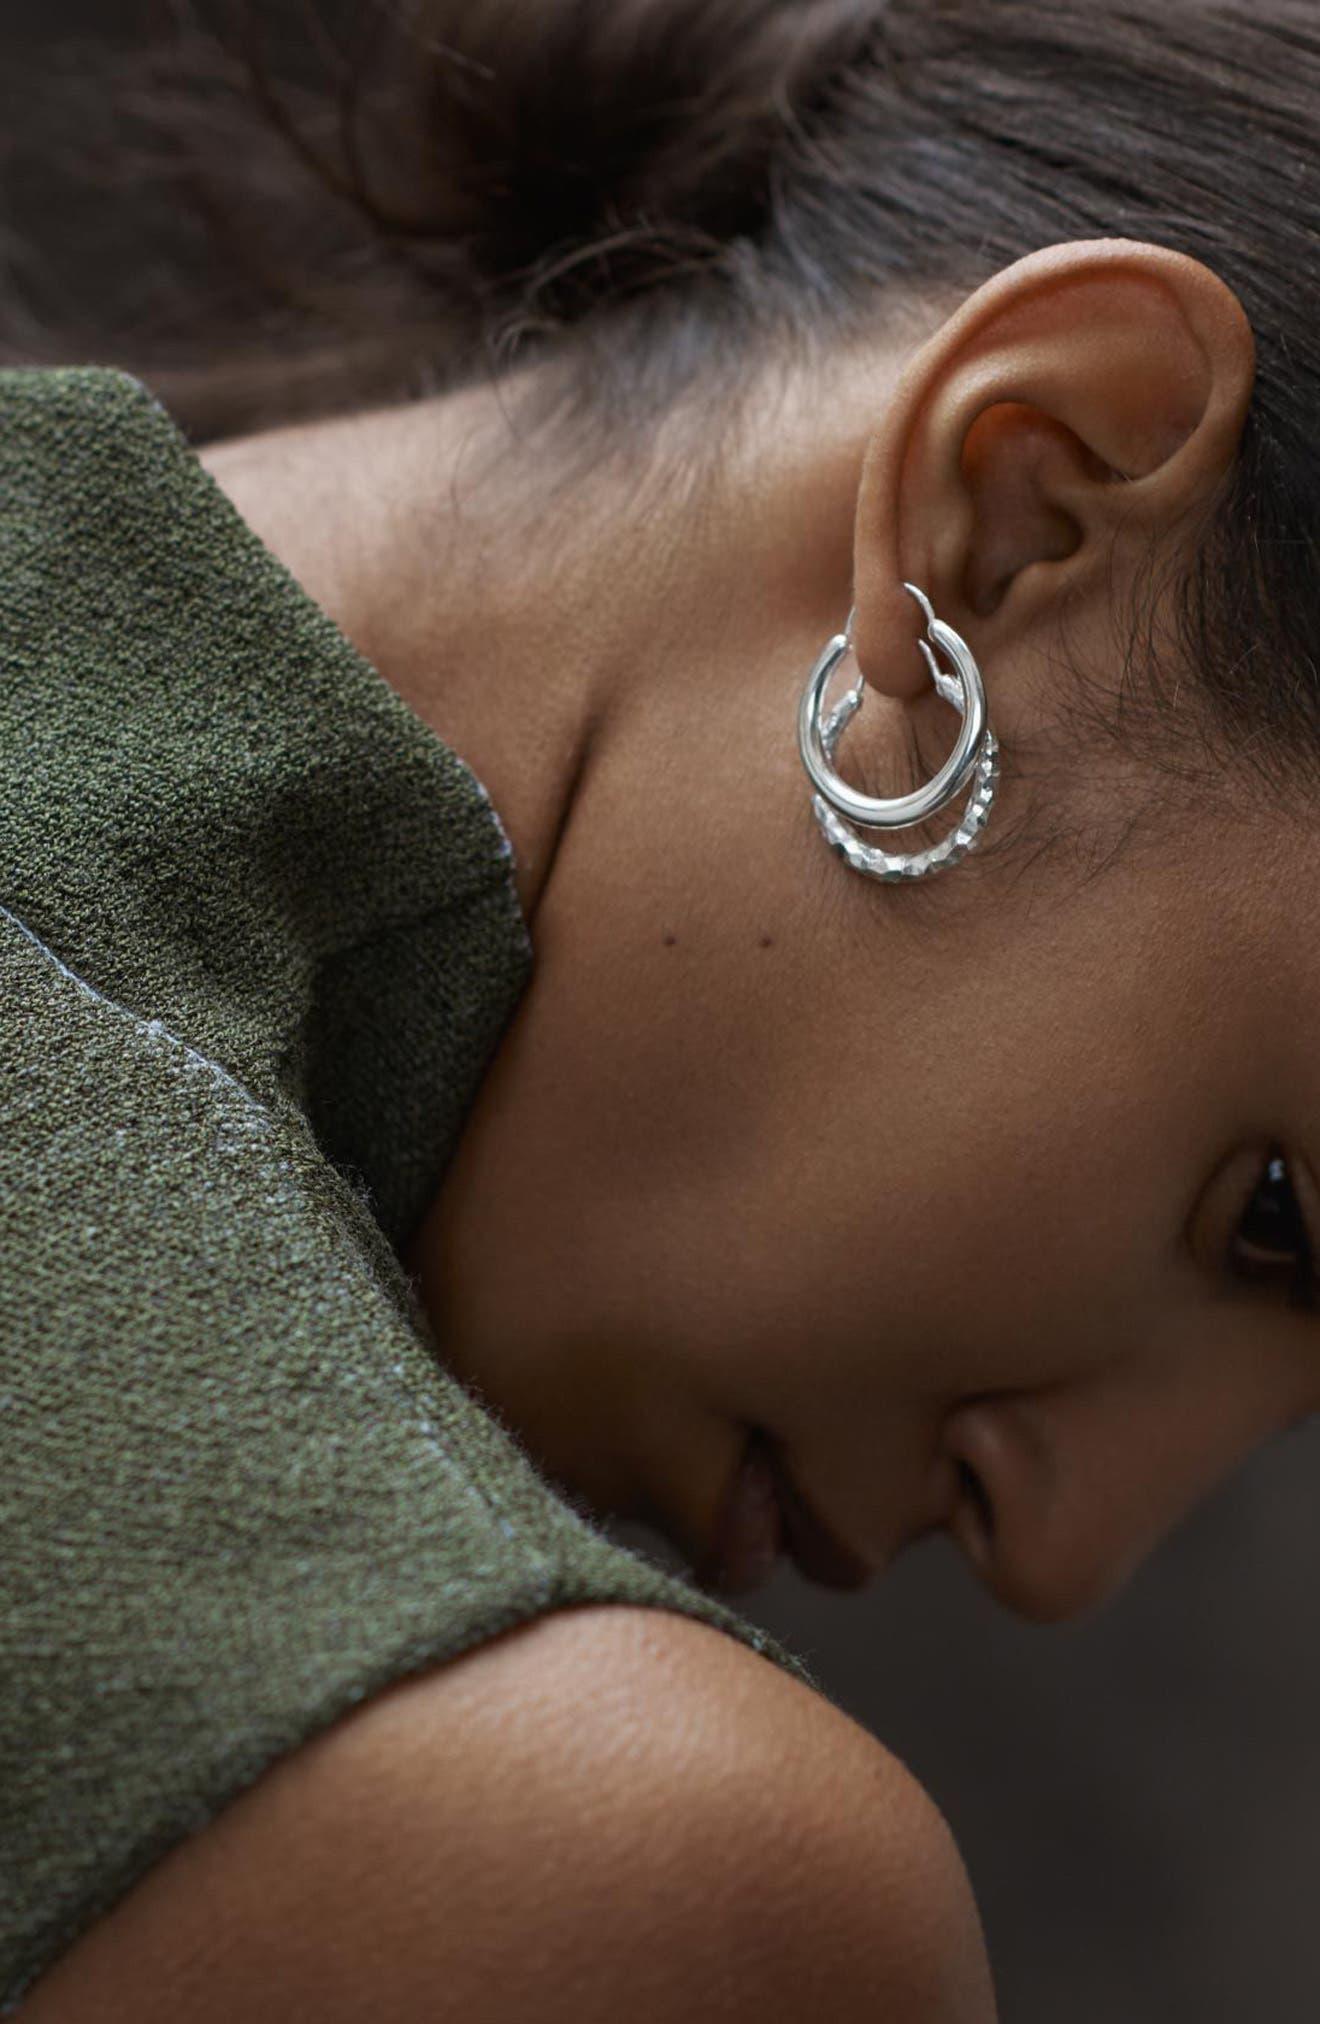 Snake Polished Silver Earrings,                             Alternate thumbnail 6, color,                             040